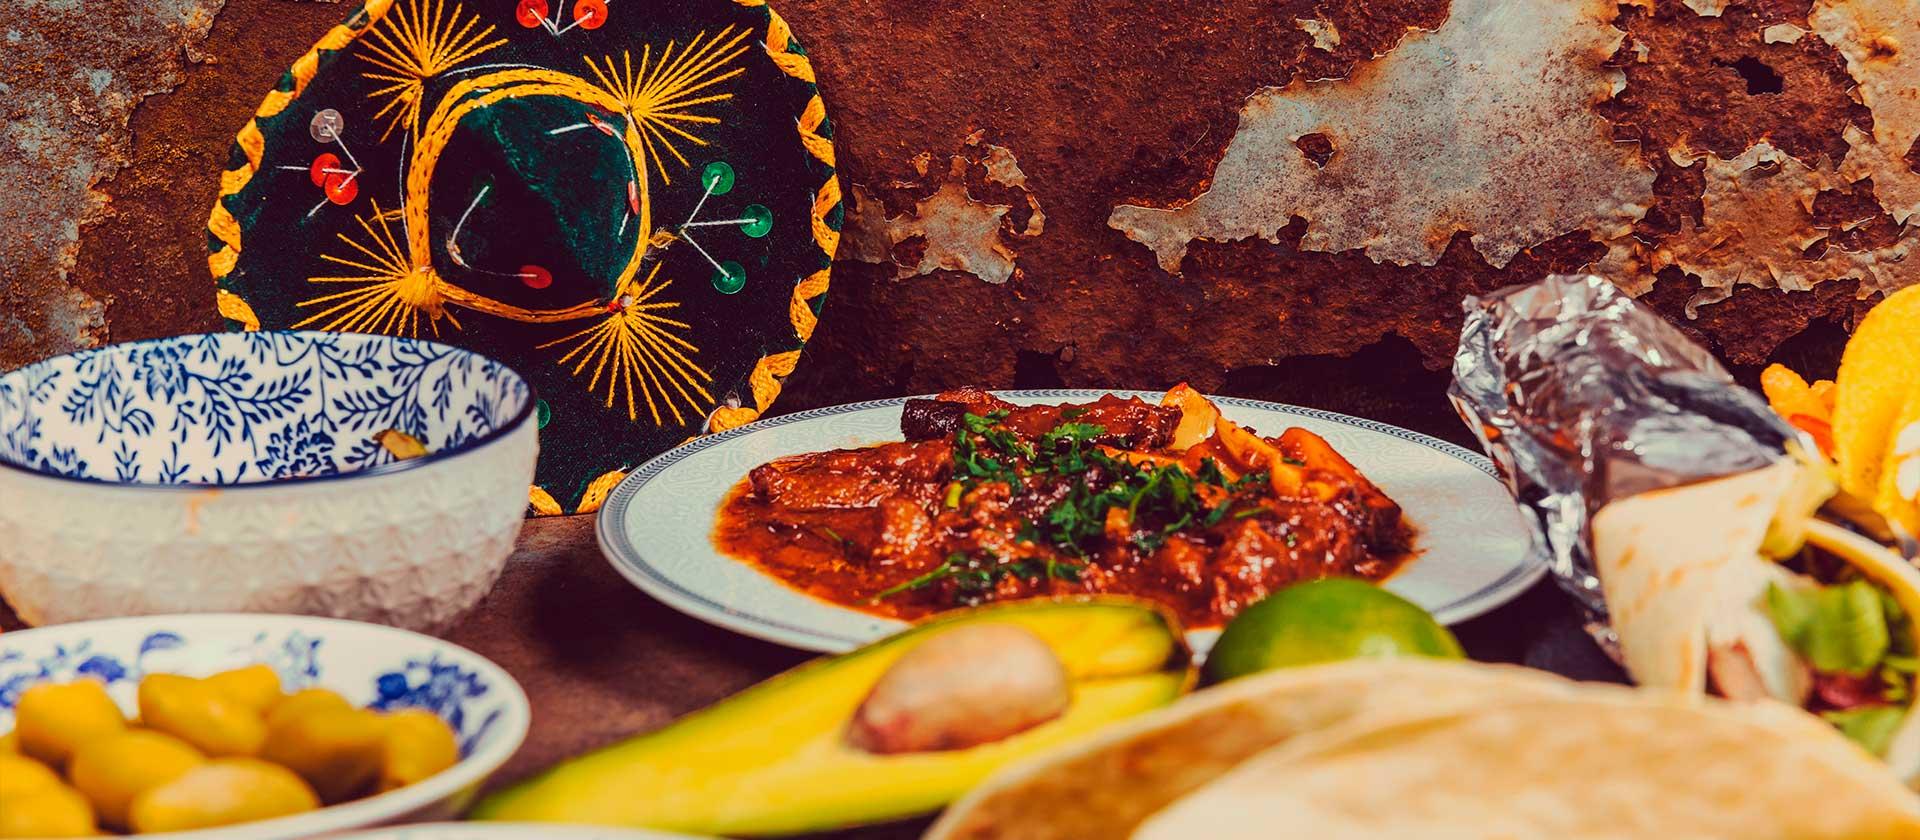 comidas mexicanas tradicional económicas